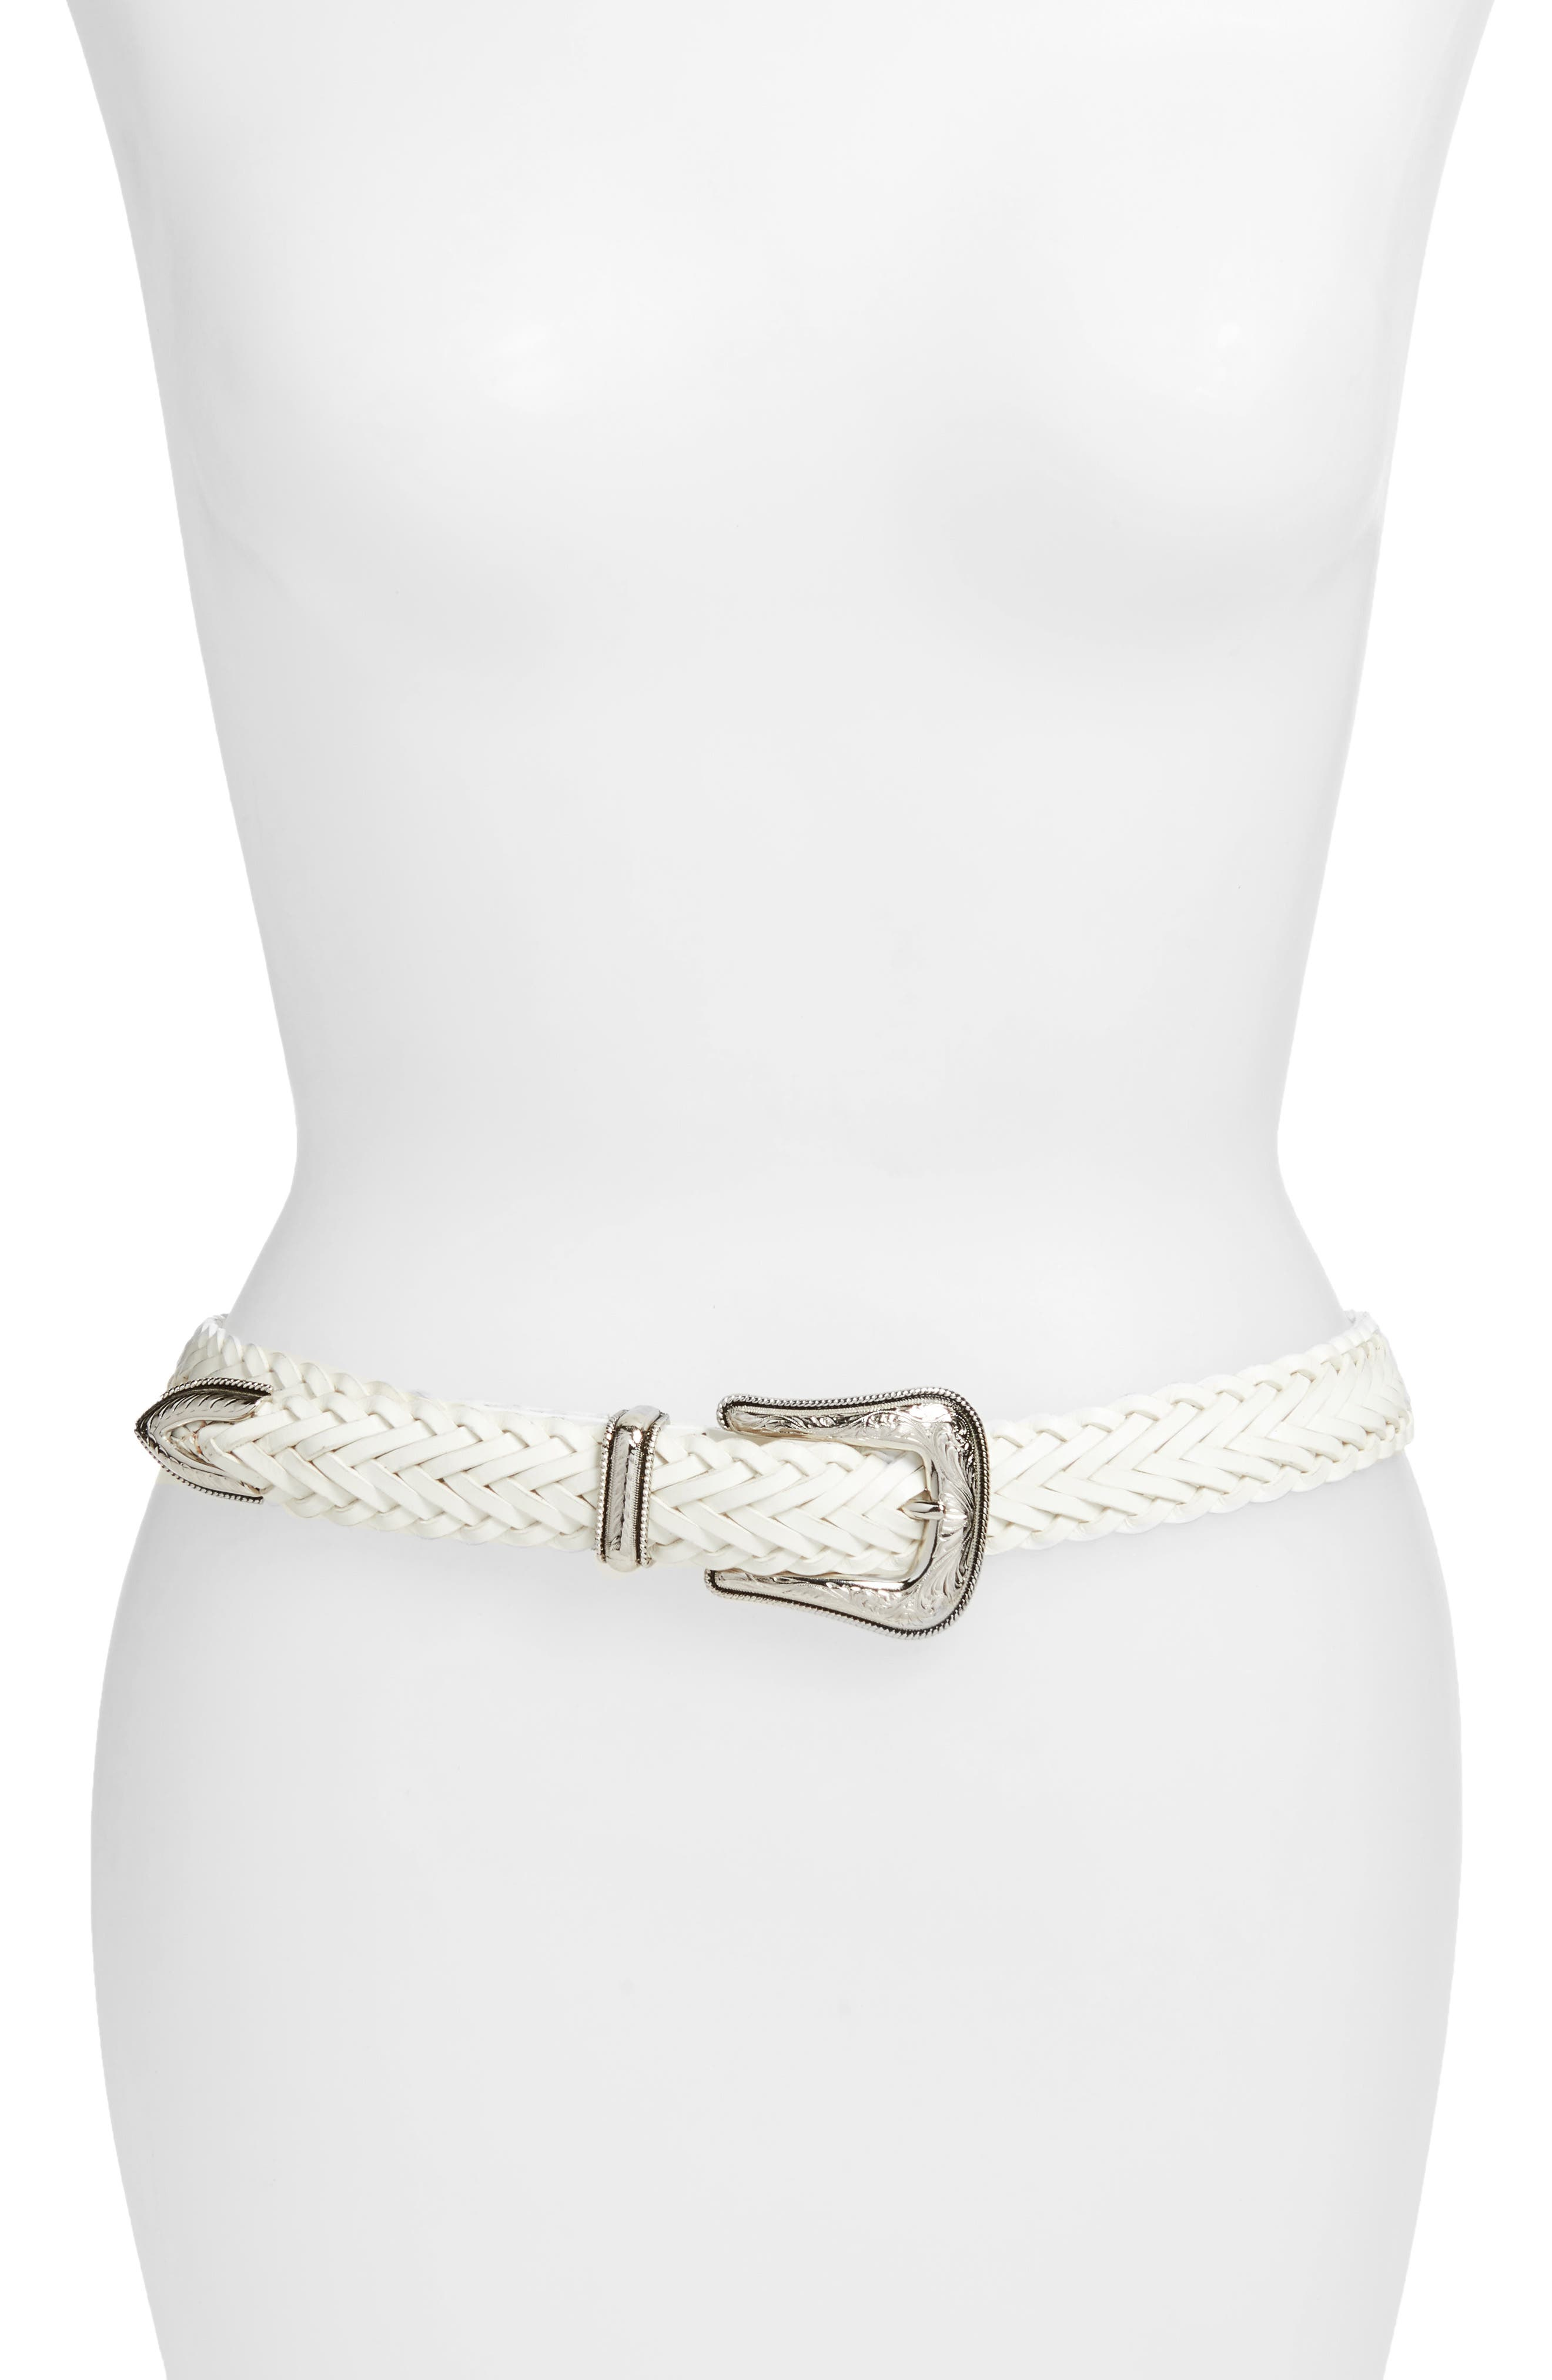 Rebecca Minkoff Braided Leather Belt